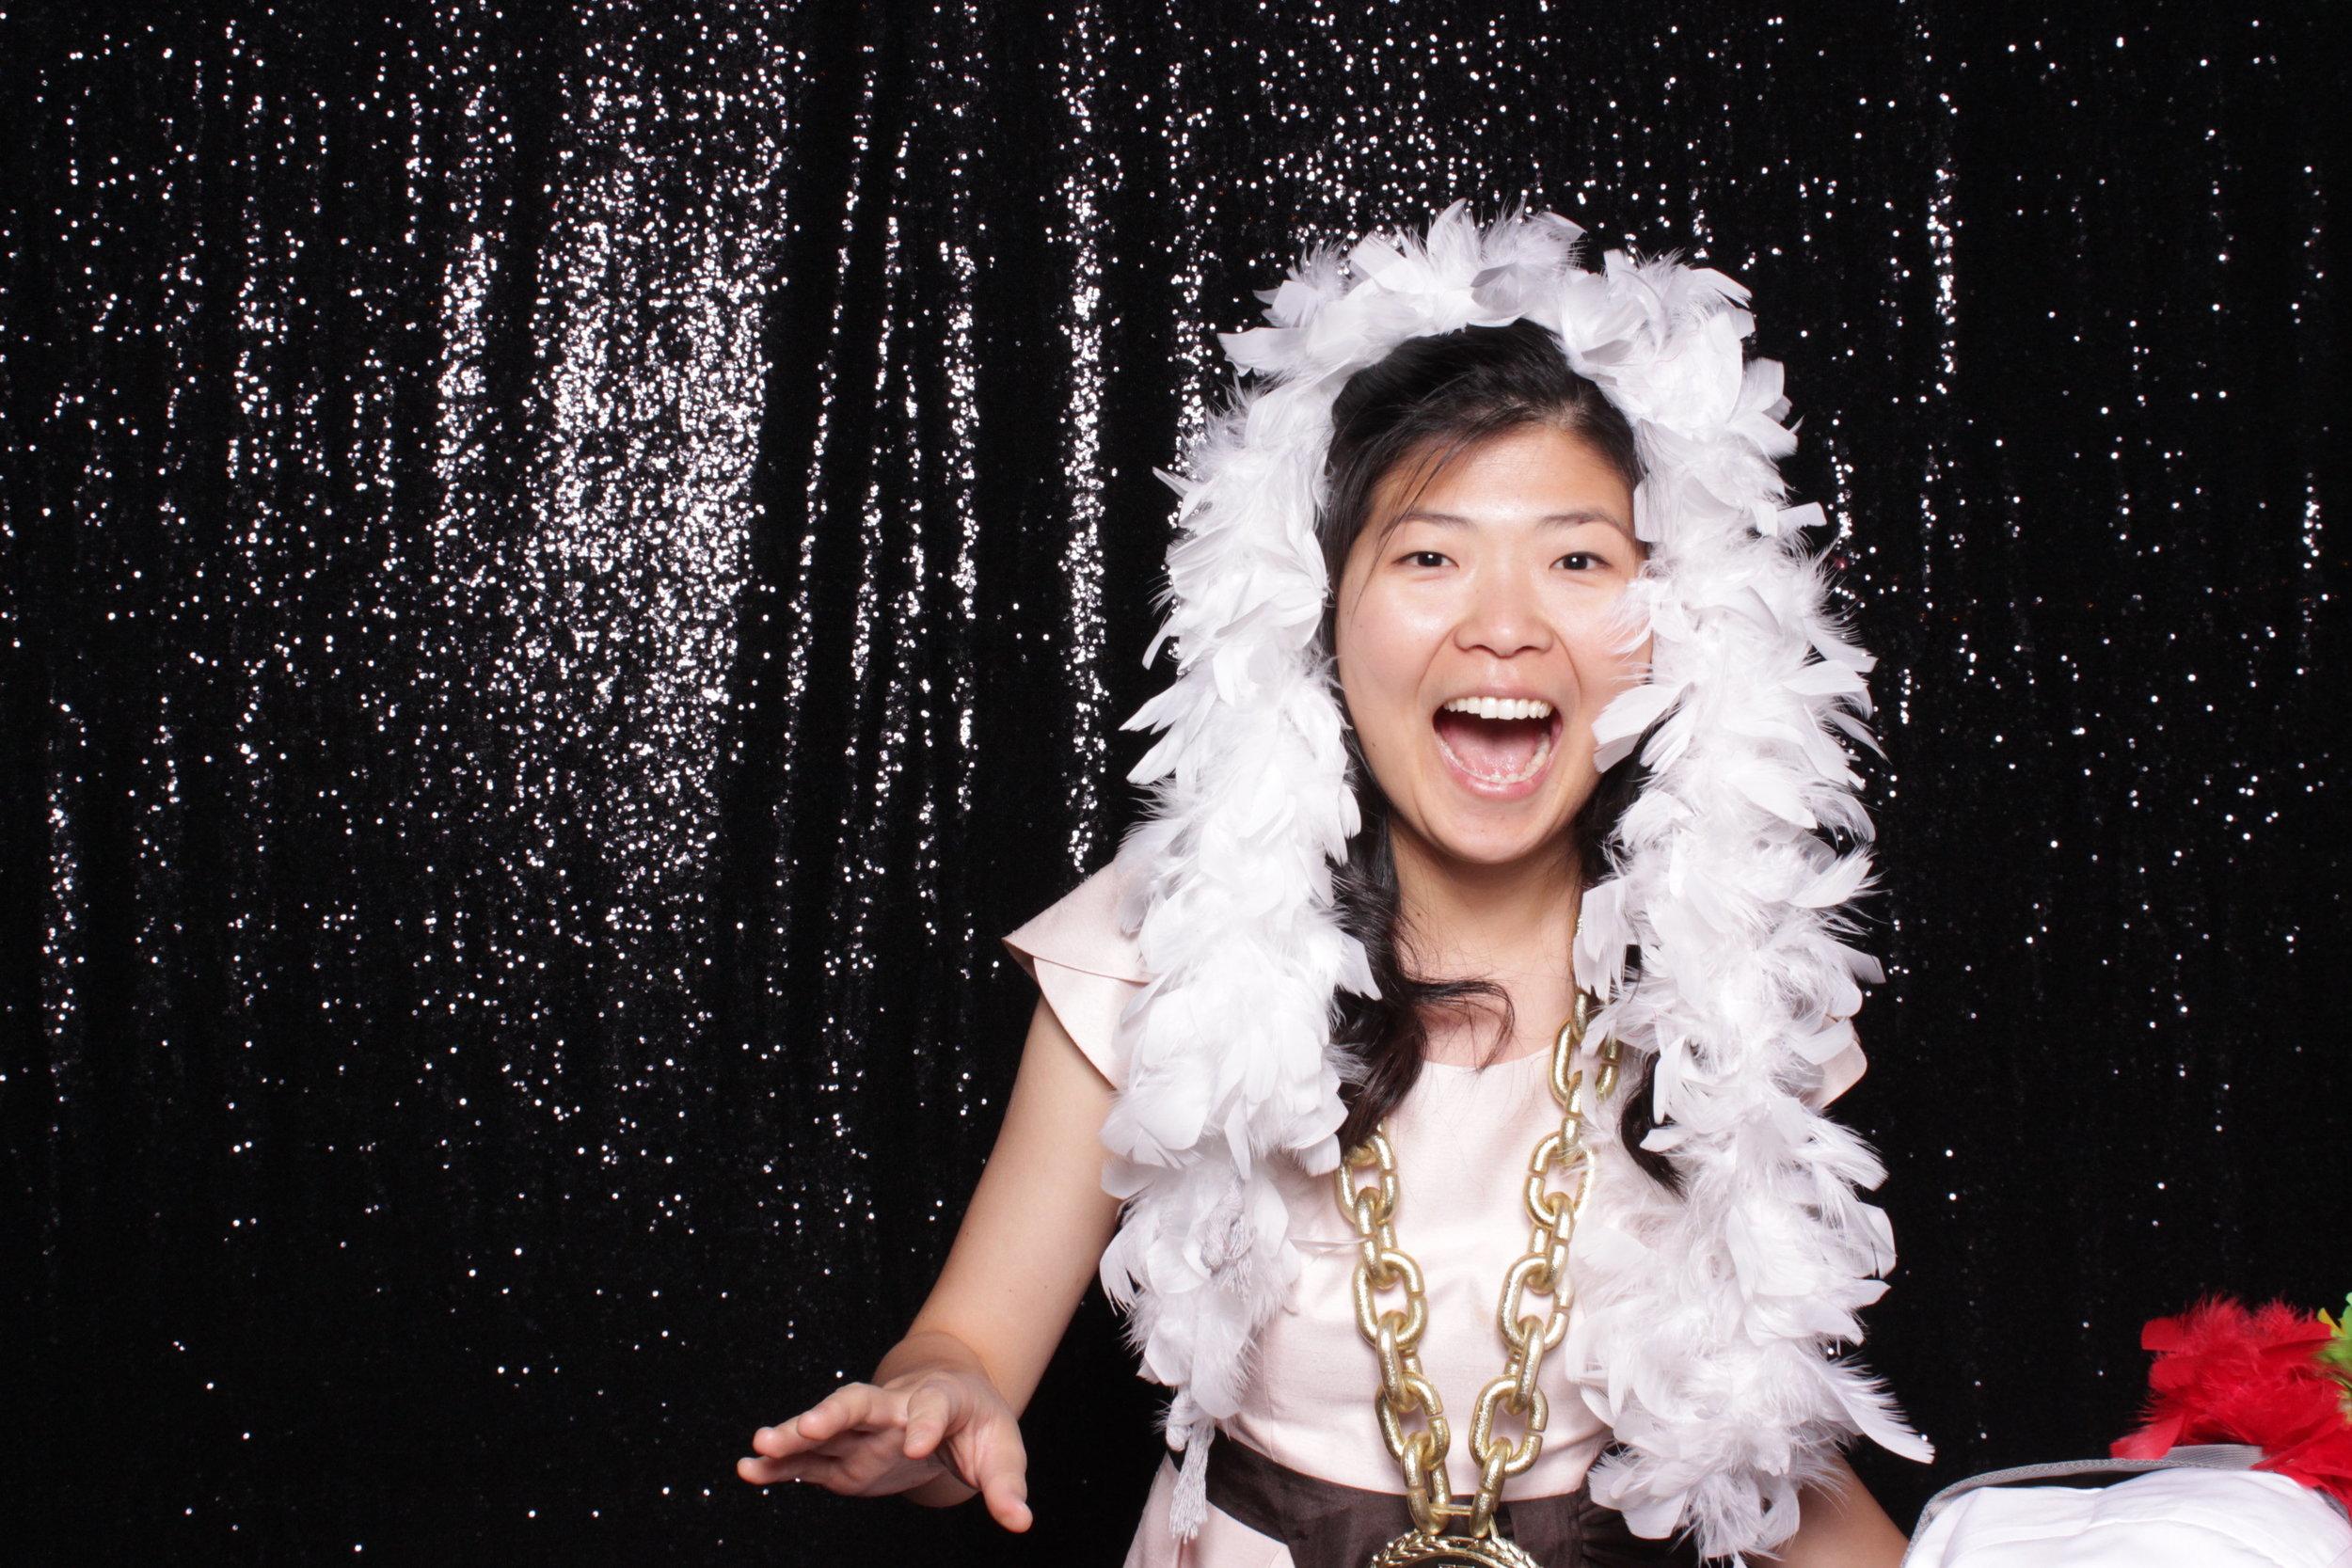 chico-wedding-fun-open-air-photo-booth